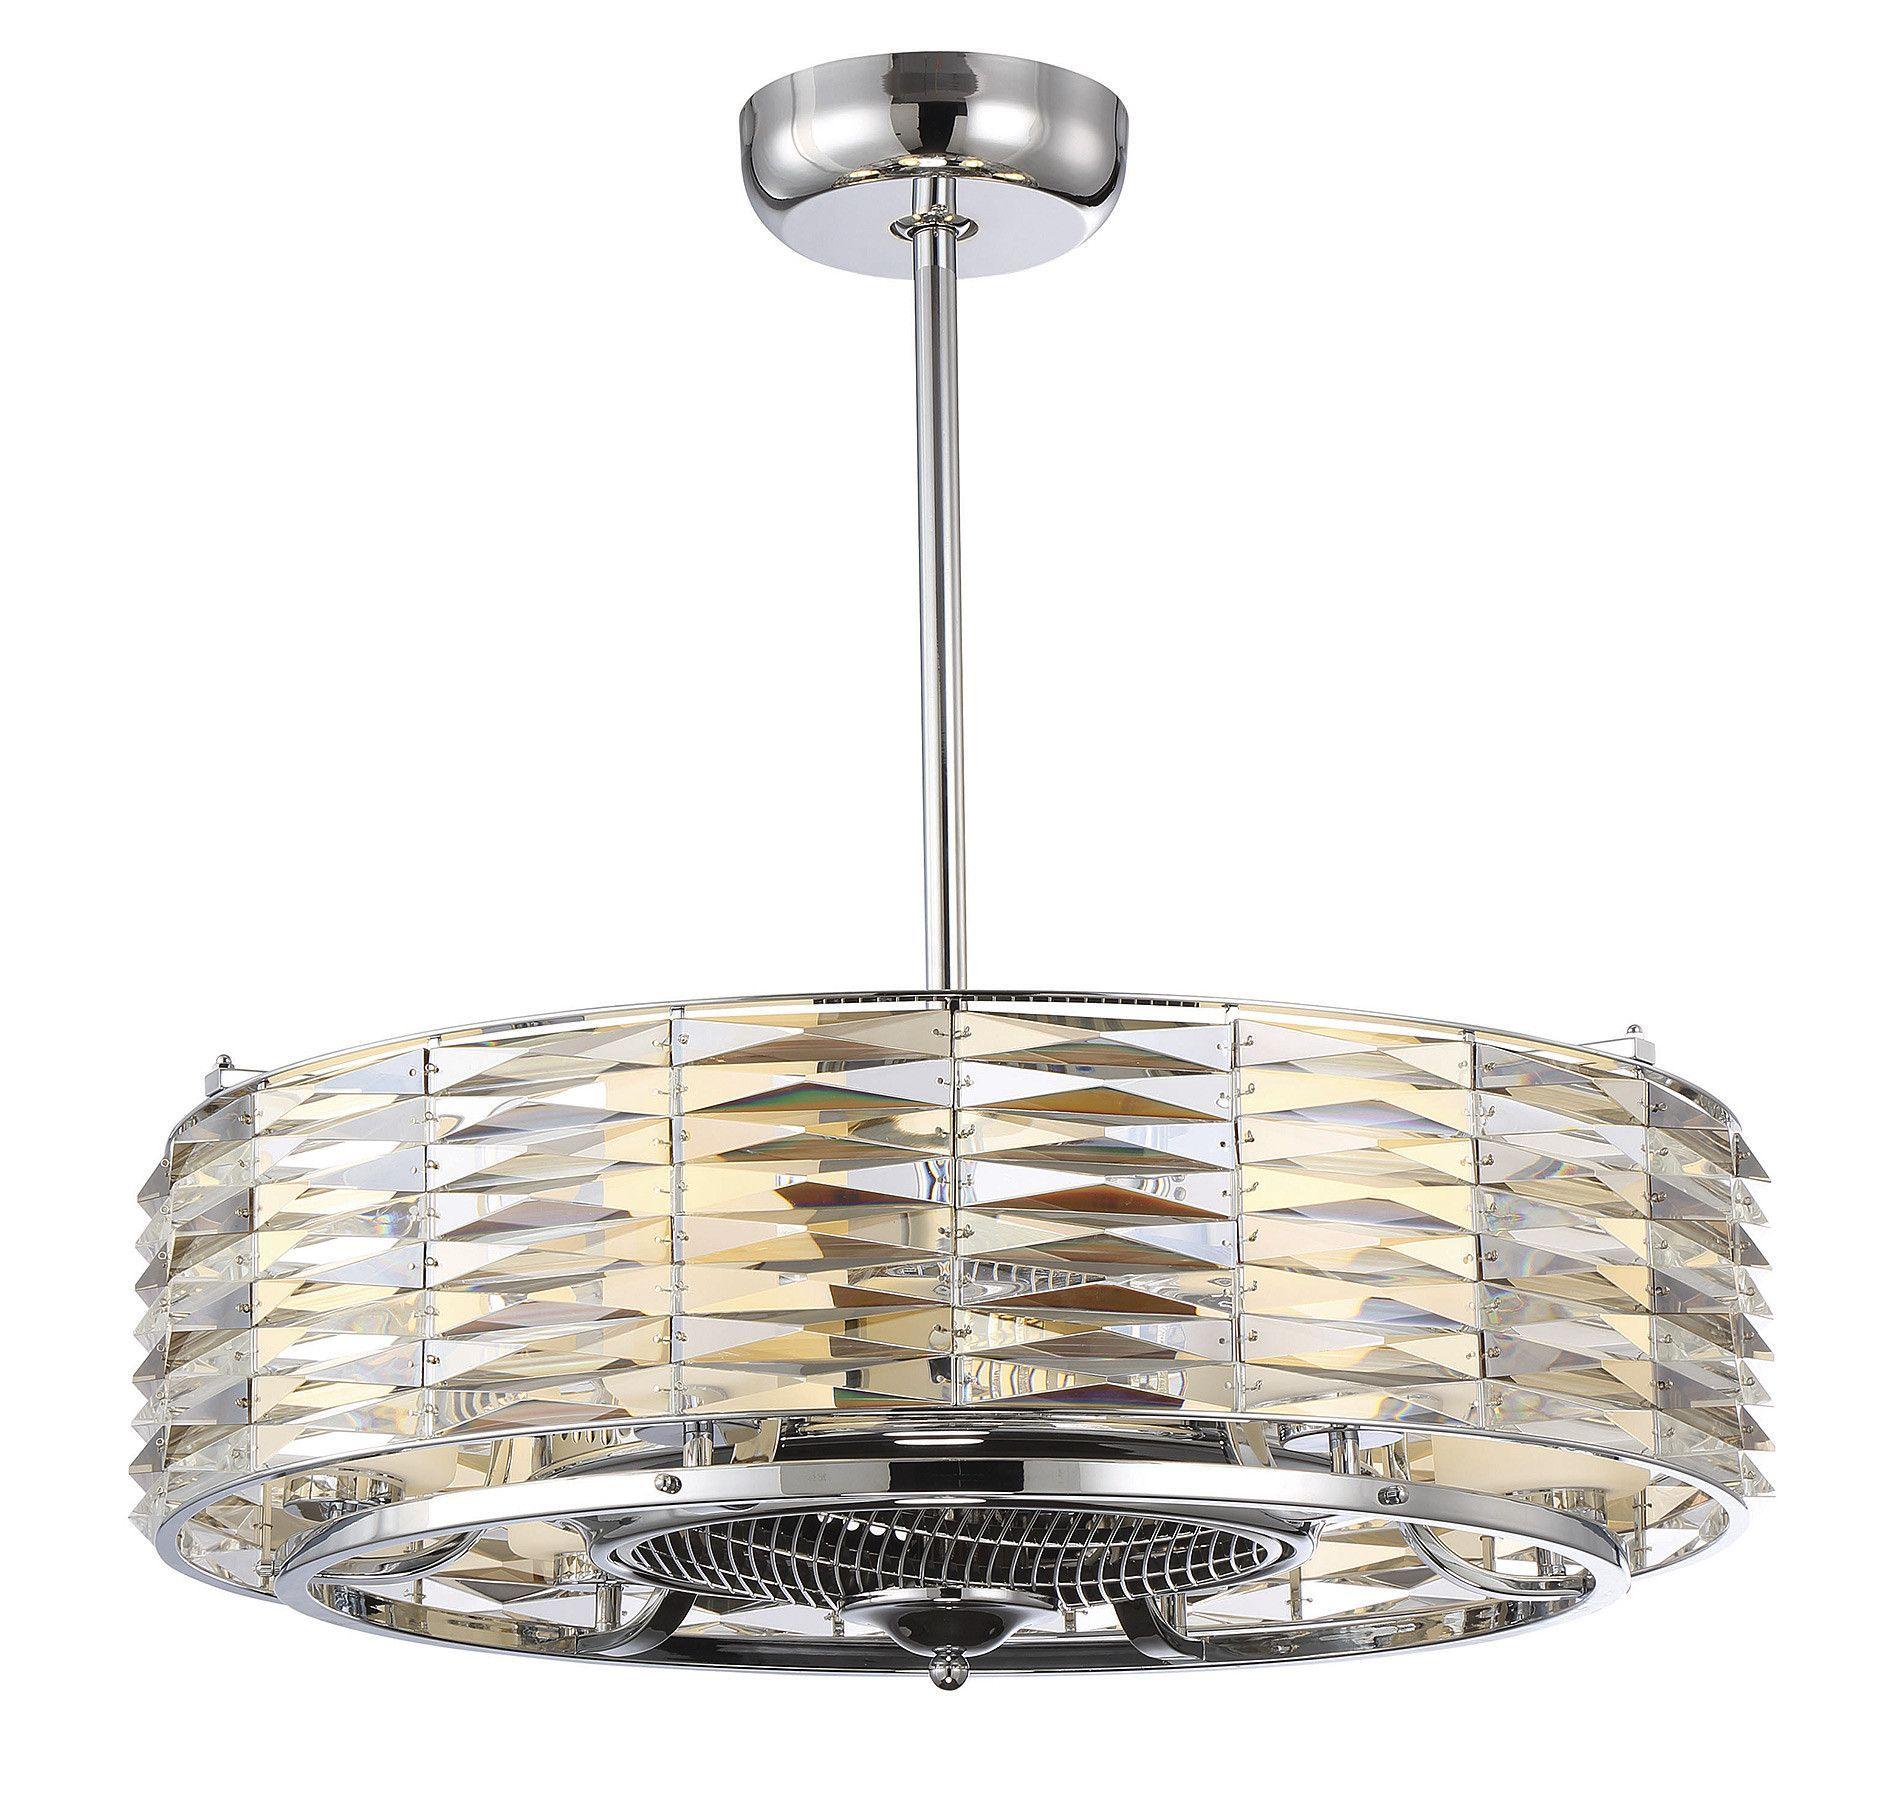 Taurus 6 Light Air Ionizing Fan D'lier